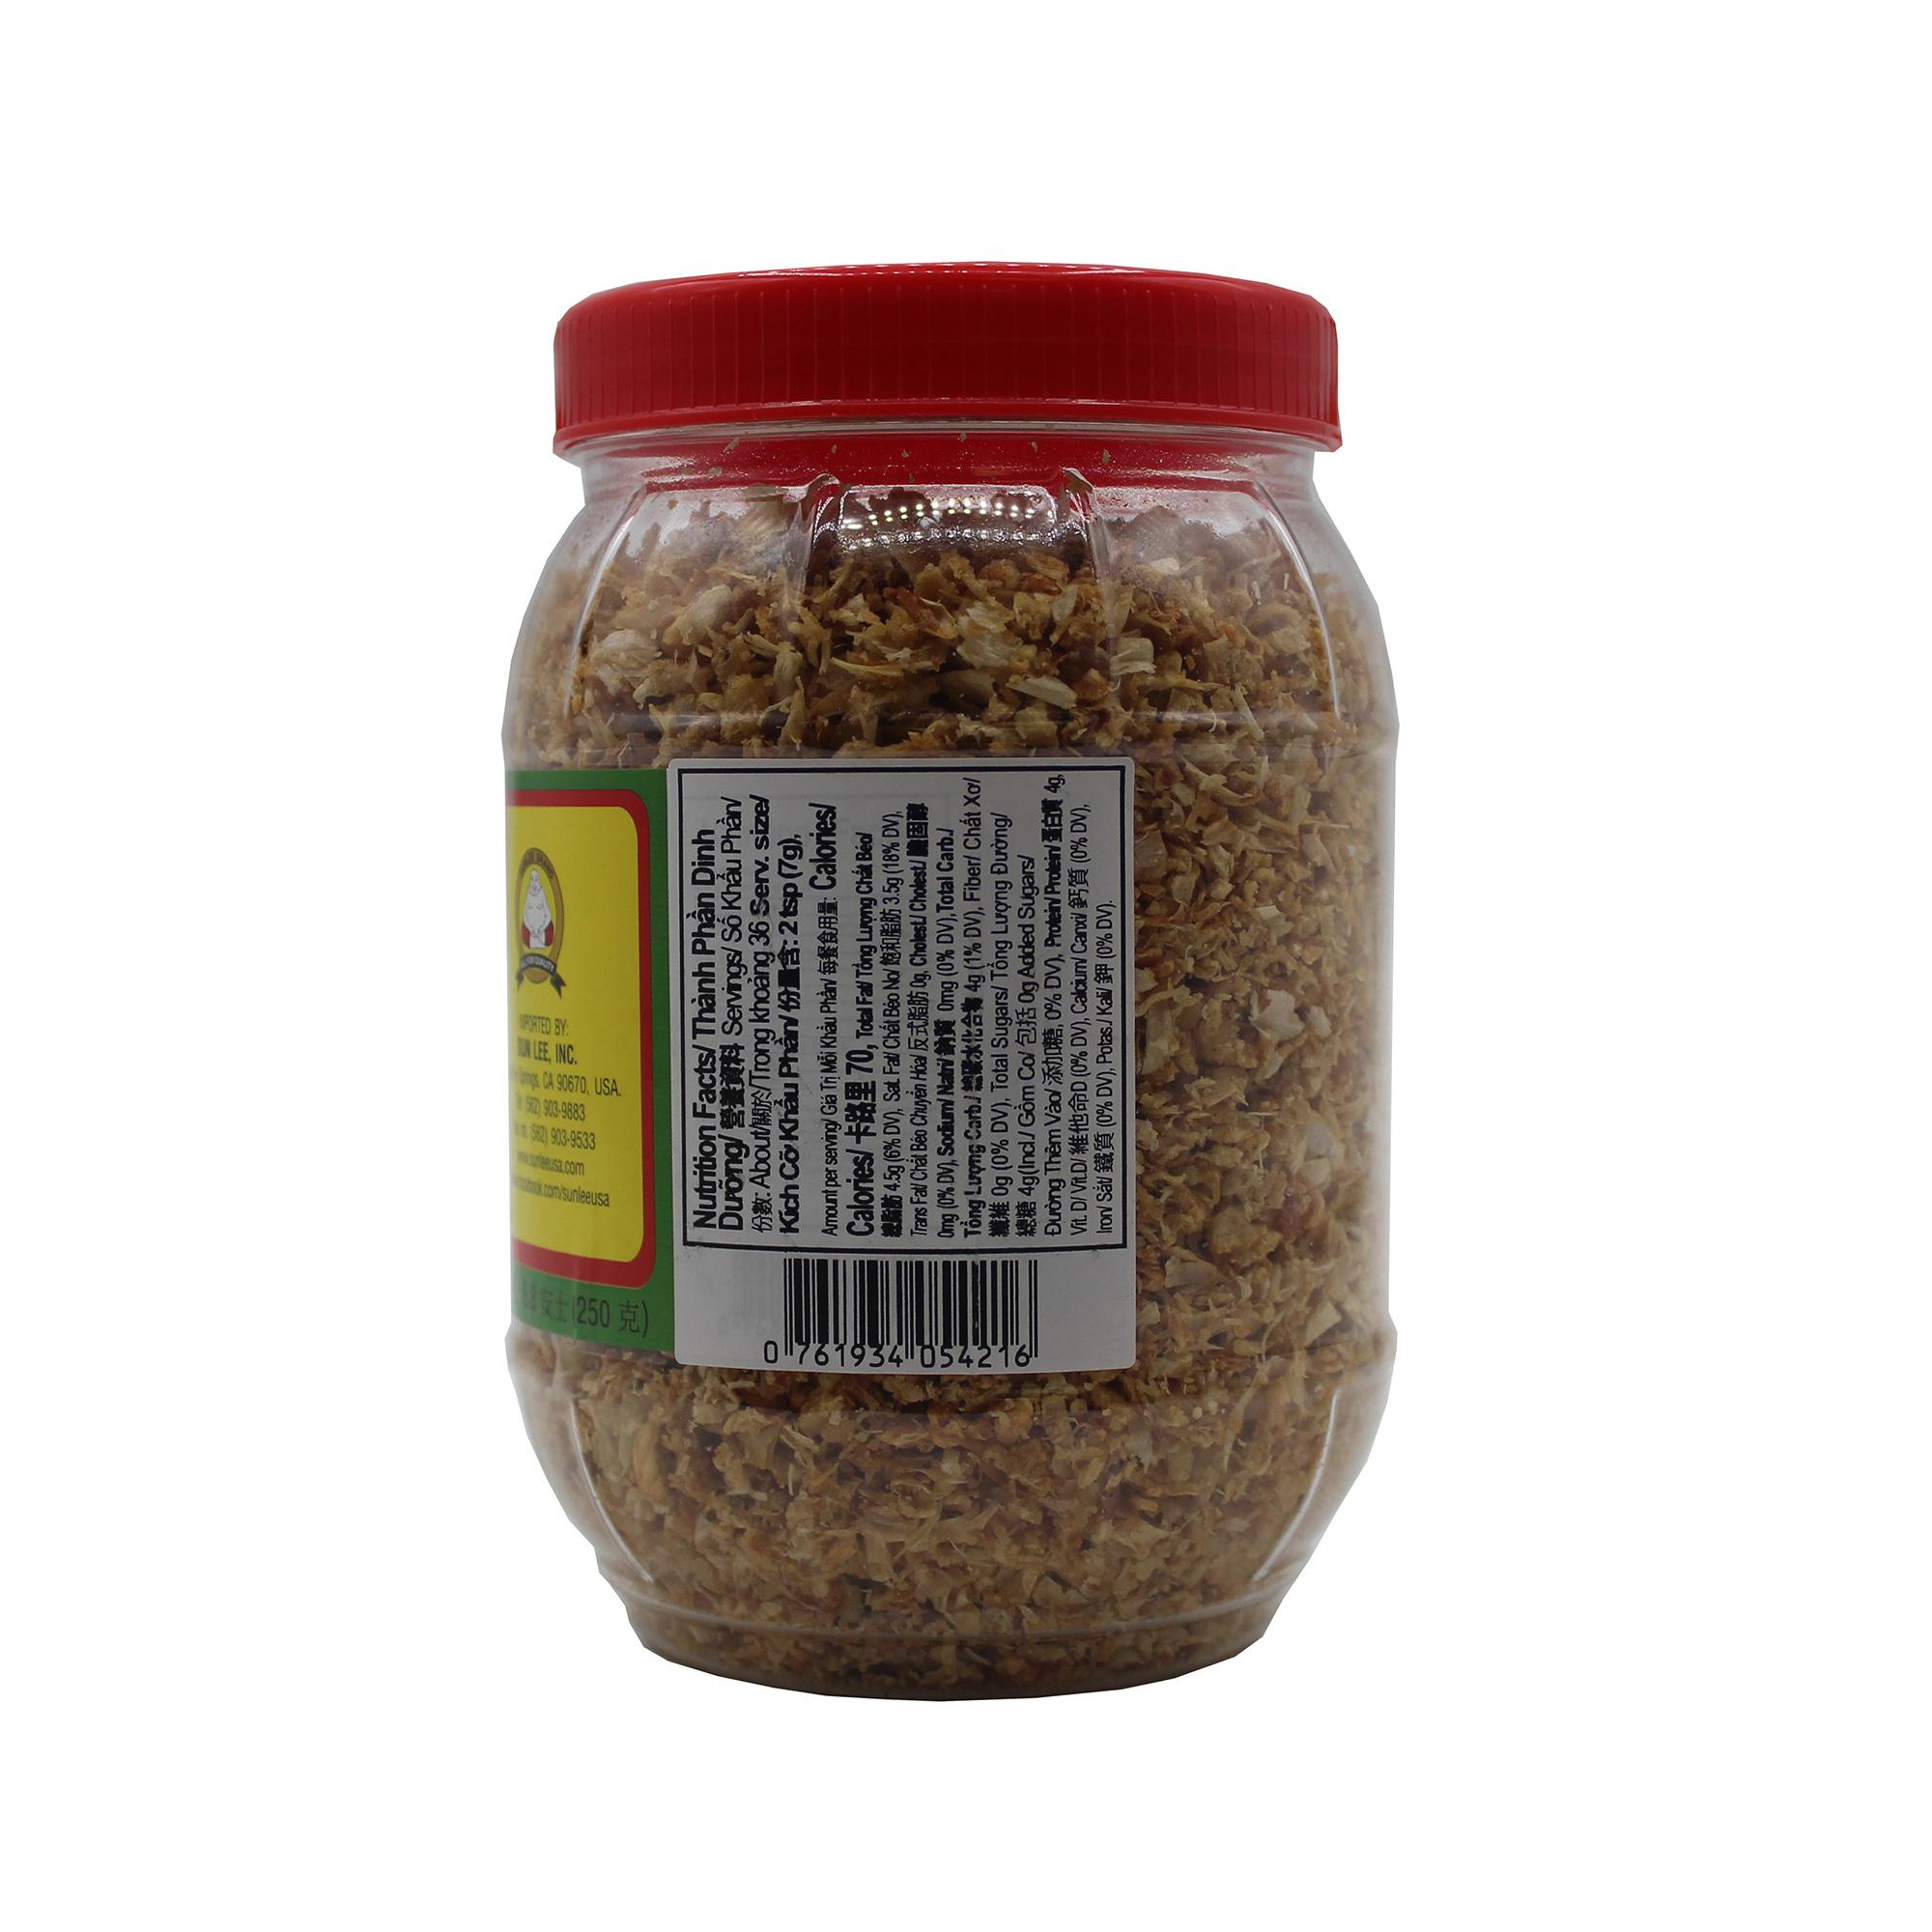 SUNLEE Fried Garlic  Toi Xay  8.8 Oz